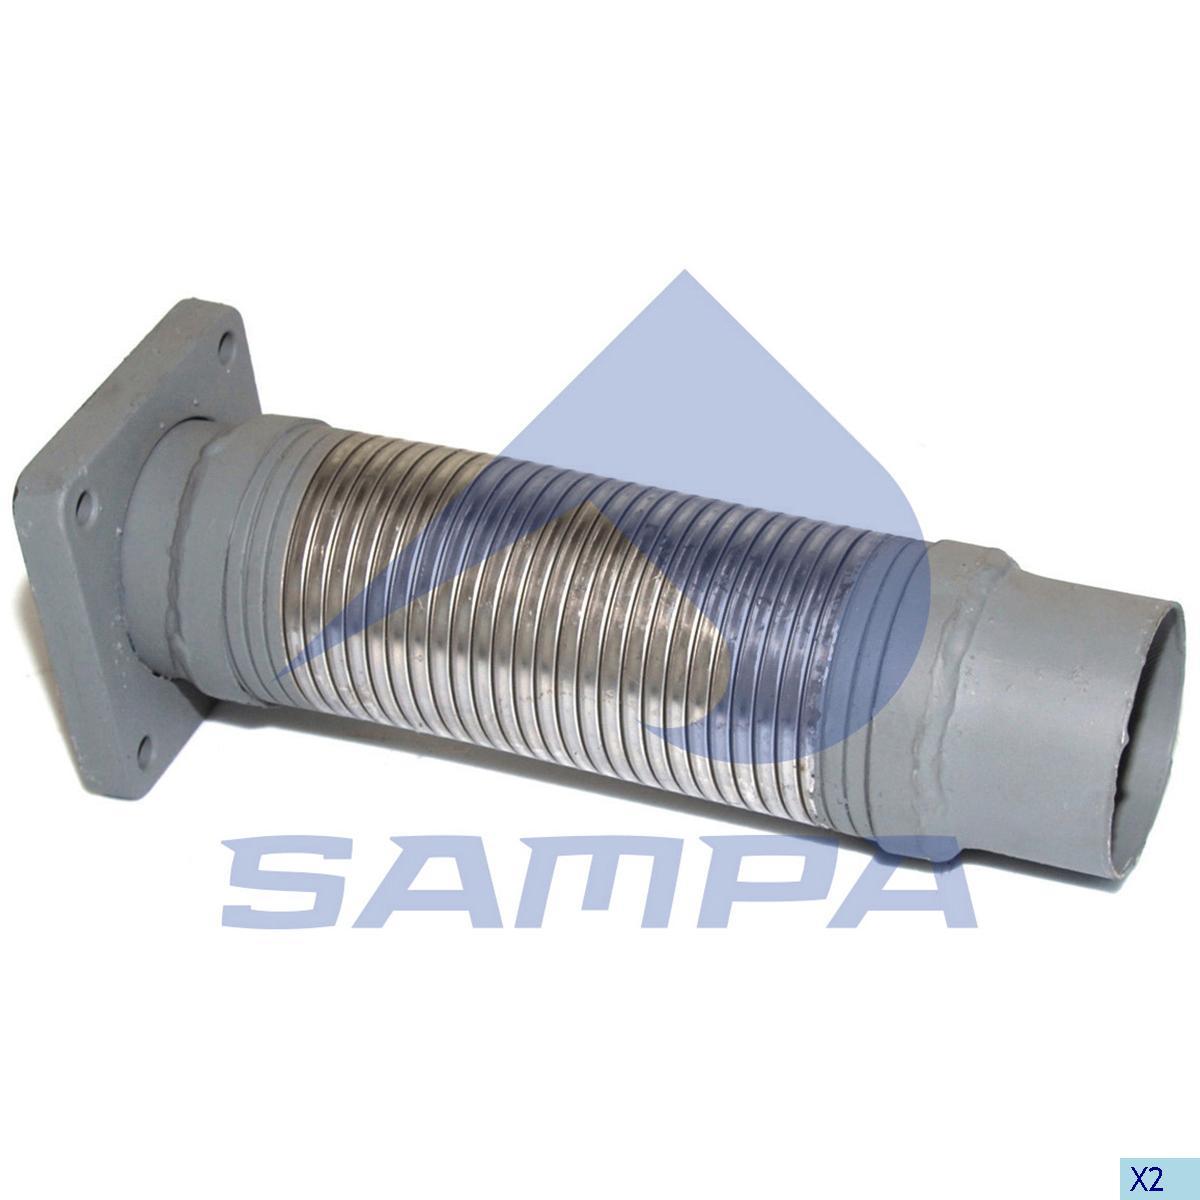 Flexible Pipe, Exhaust, Iveco, Engine